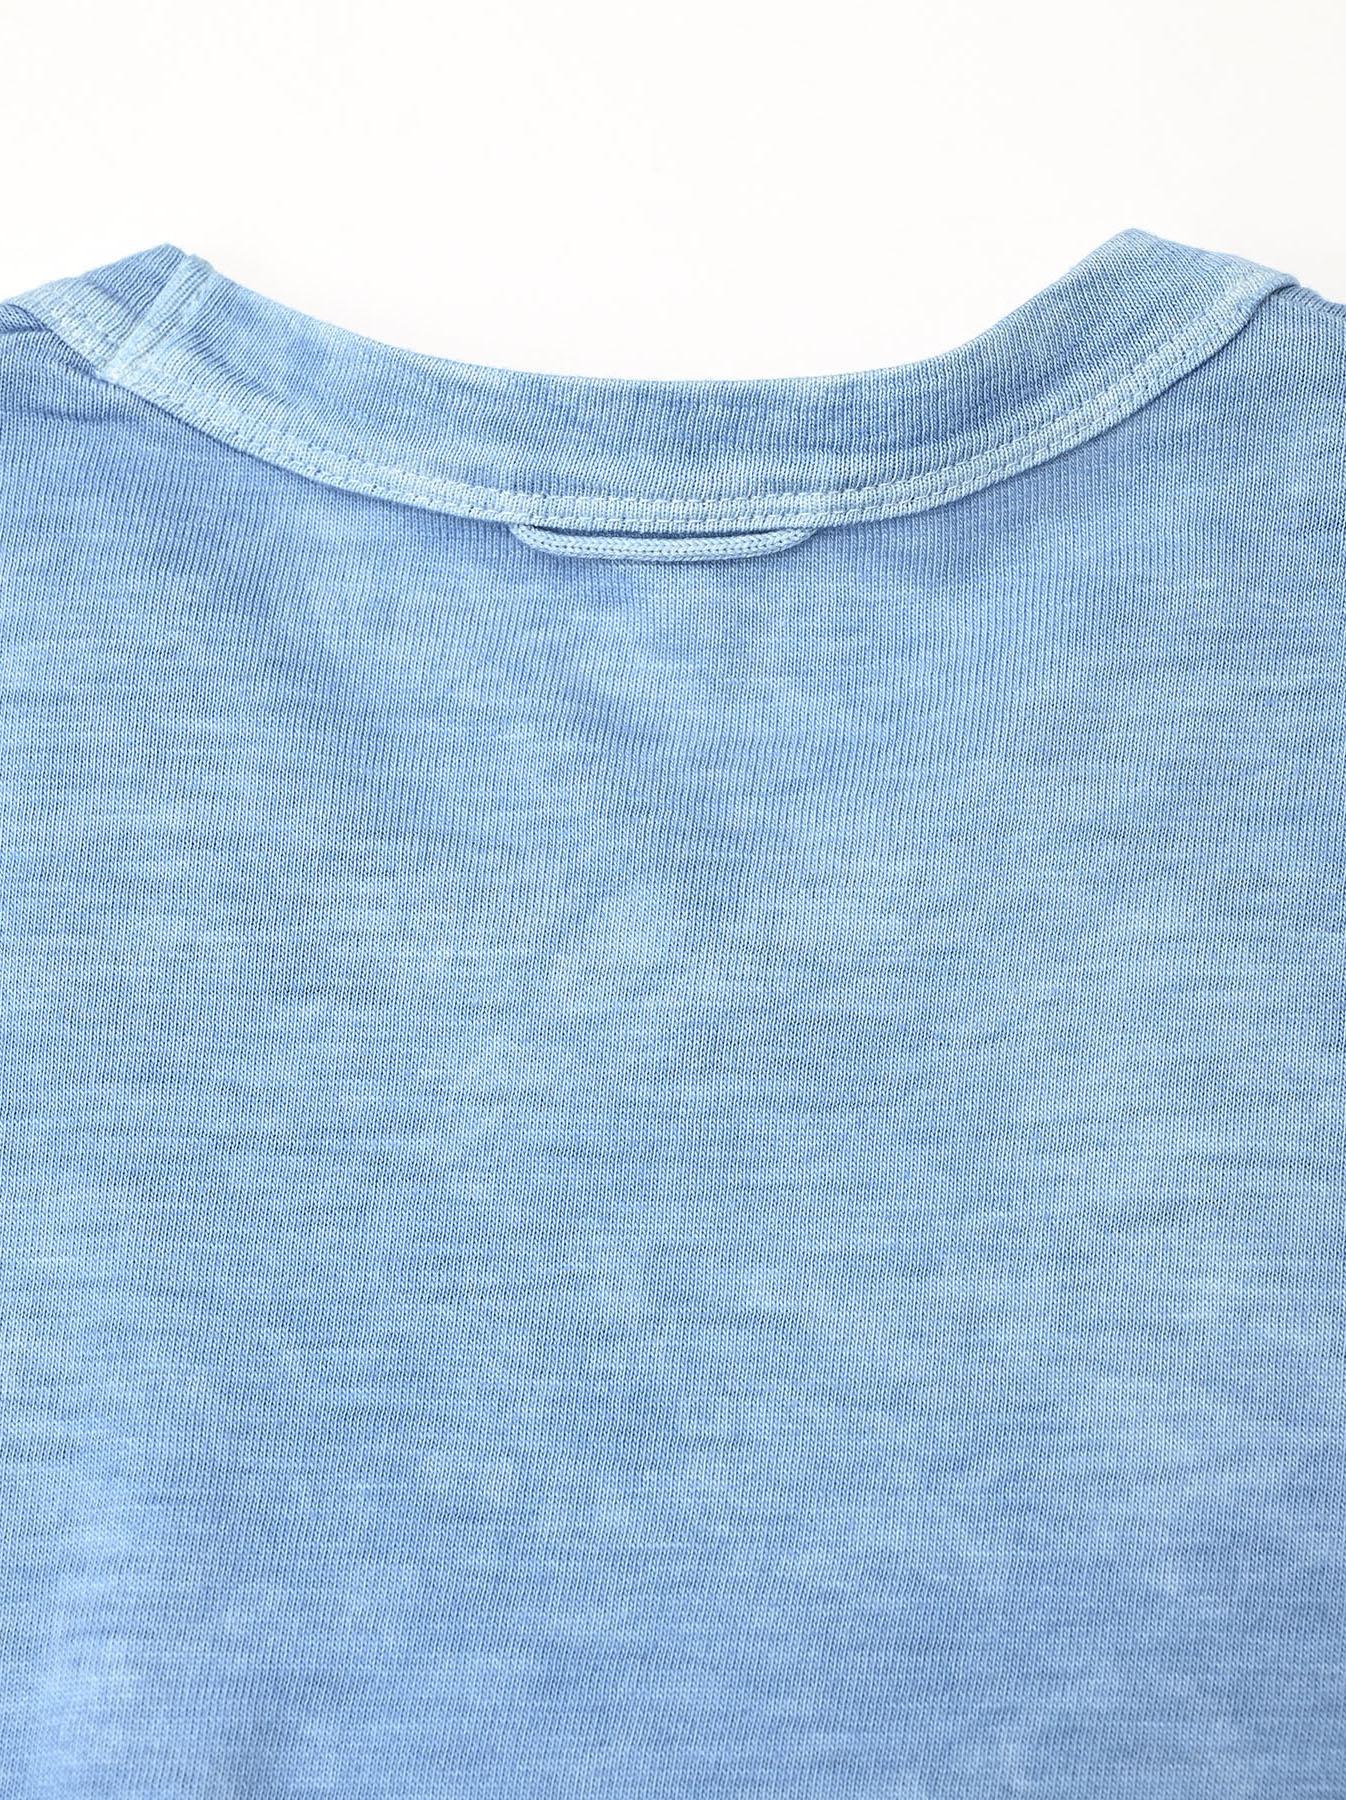 Ai Organic Supima Tenjiku Long-sleeved T-shirt-8